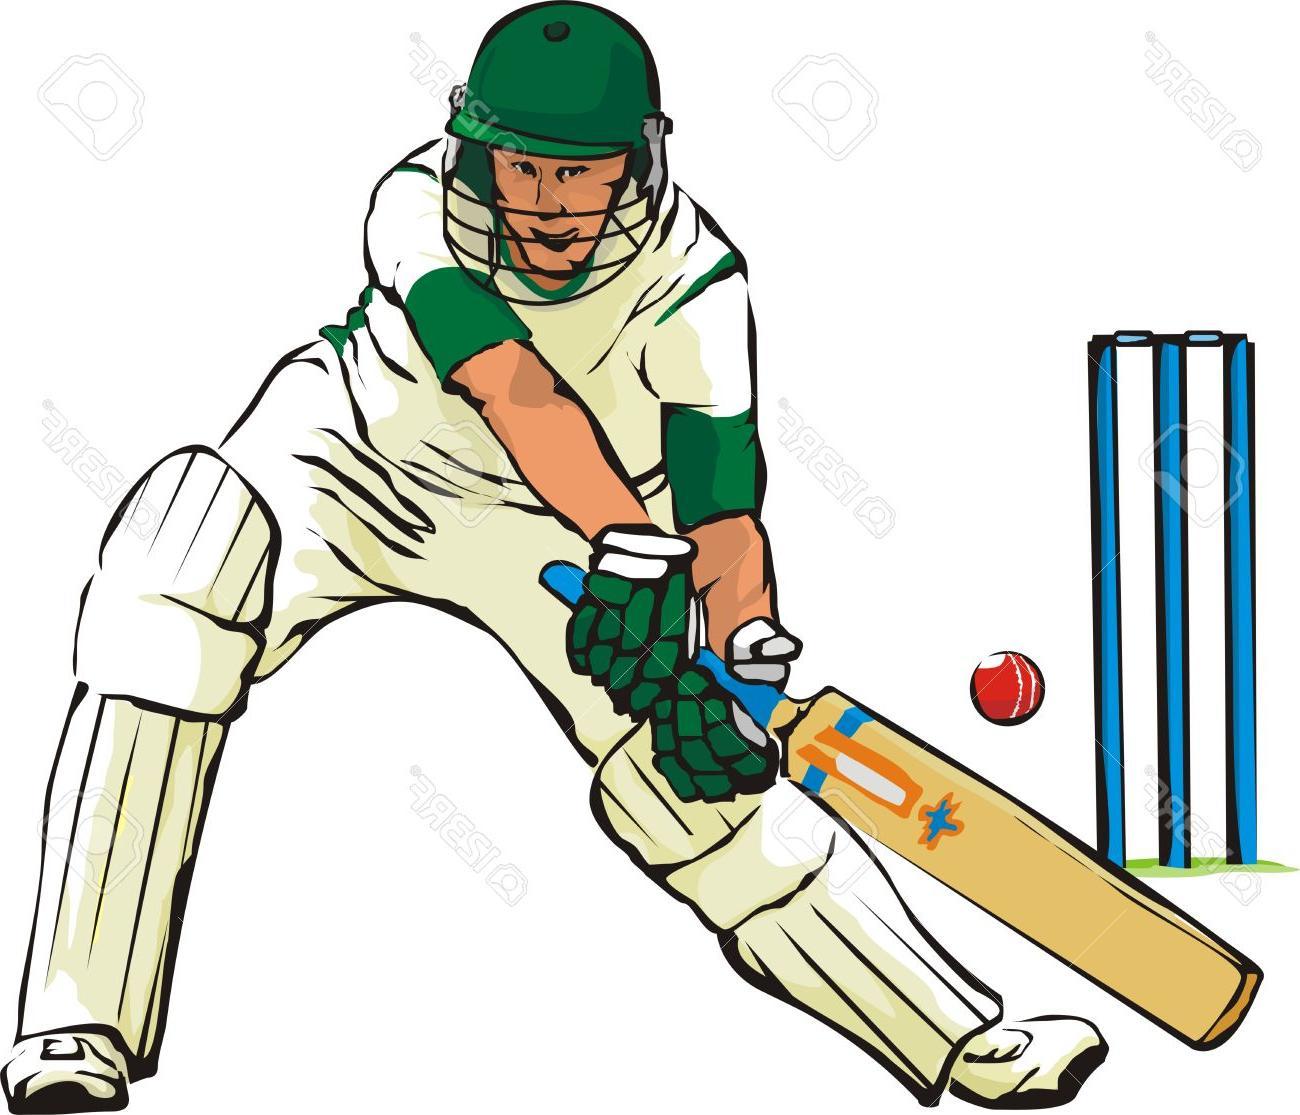 Cricket Clipart.